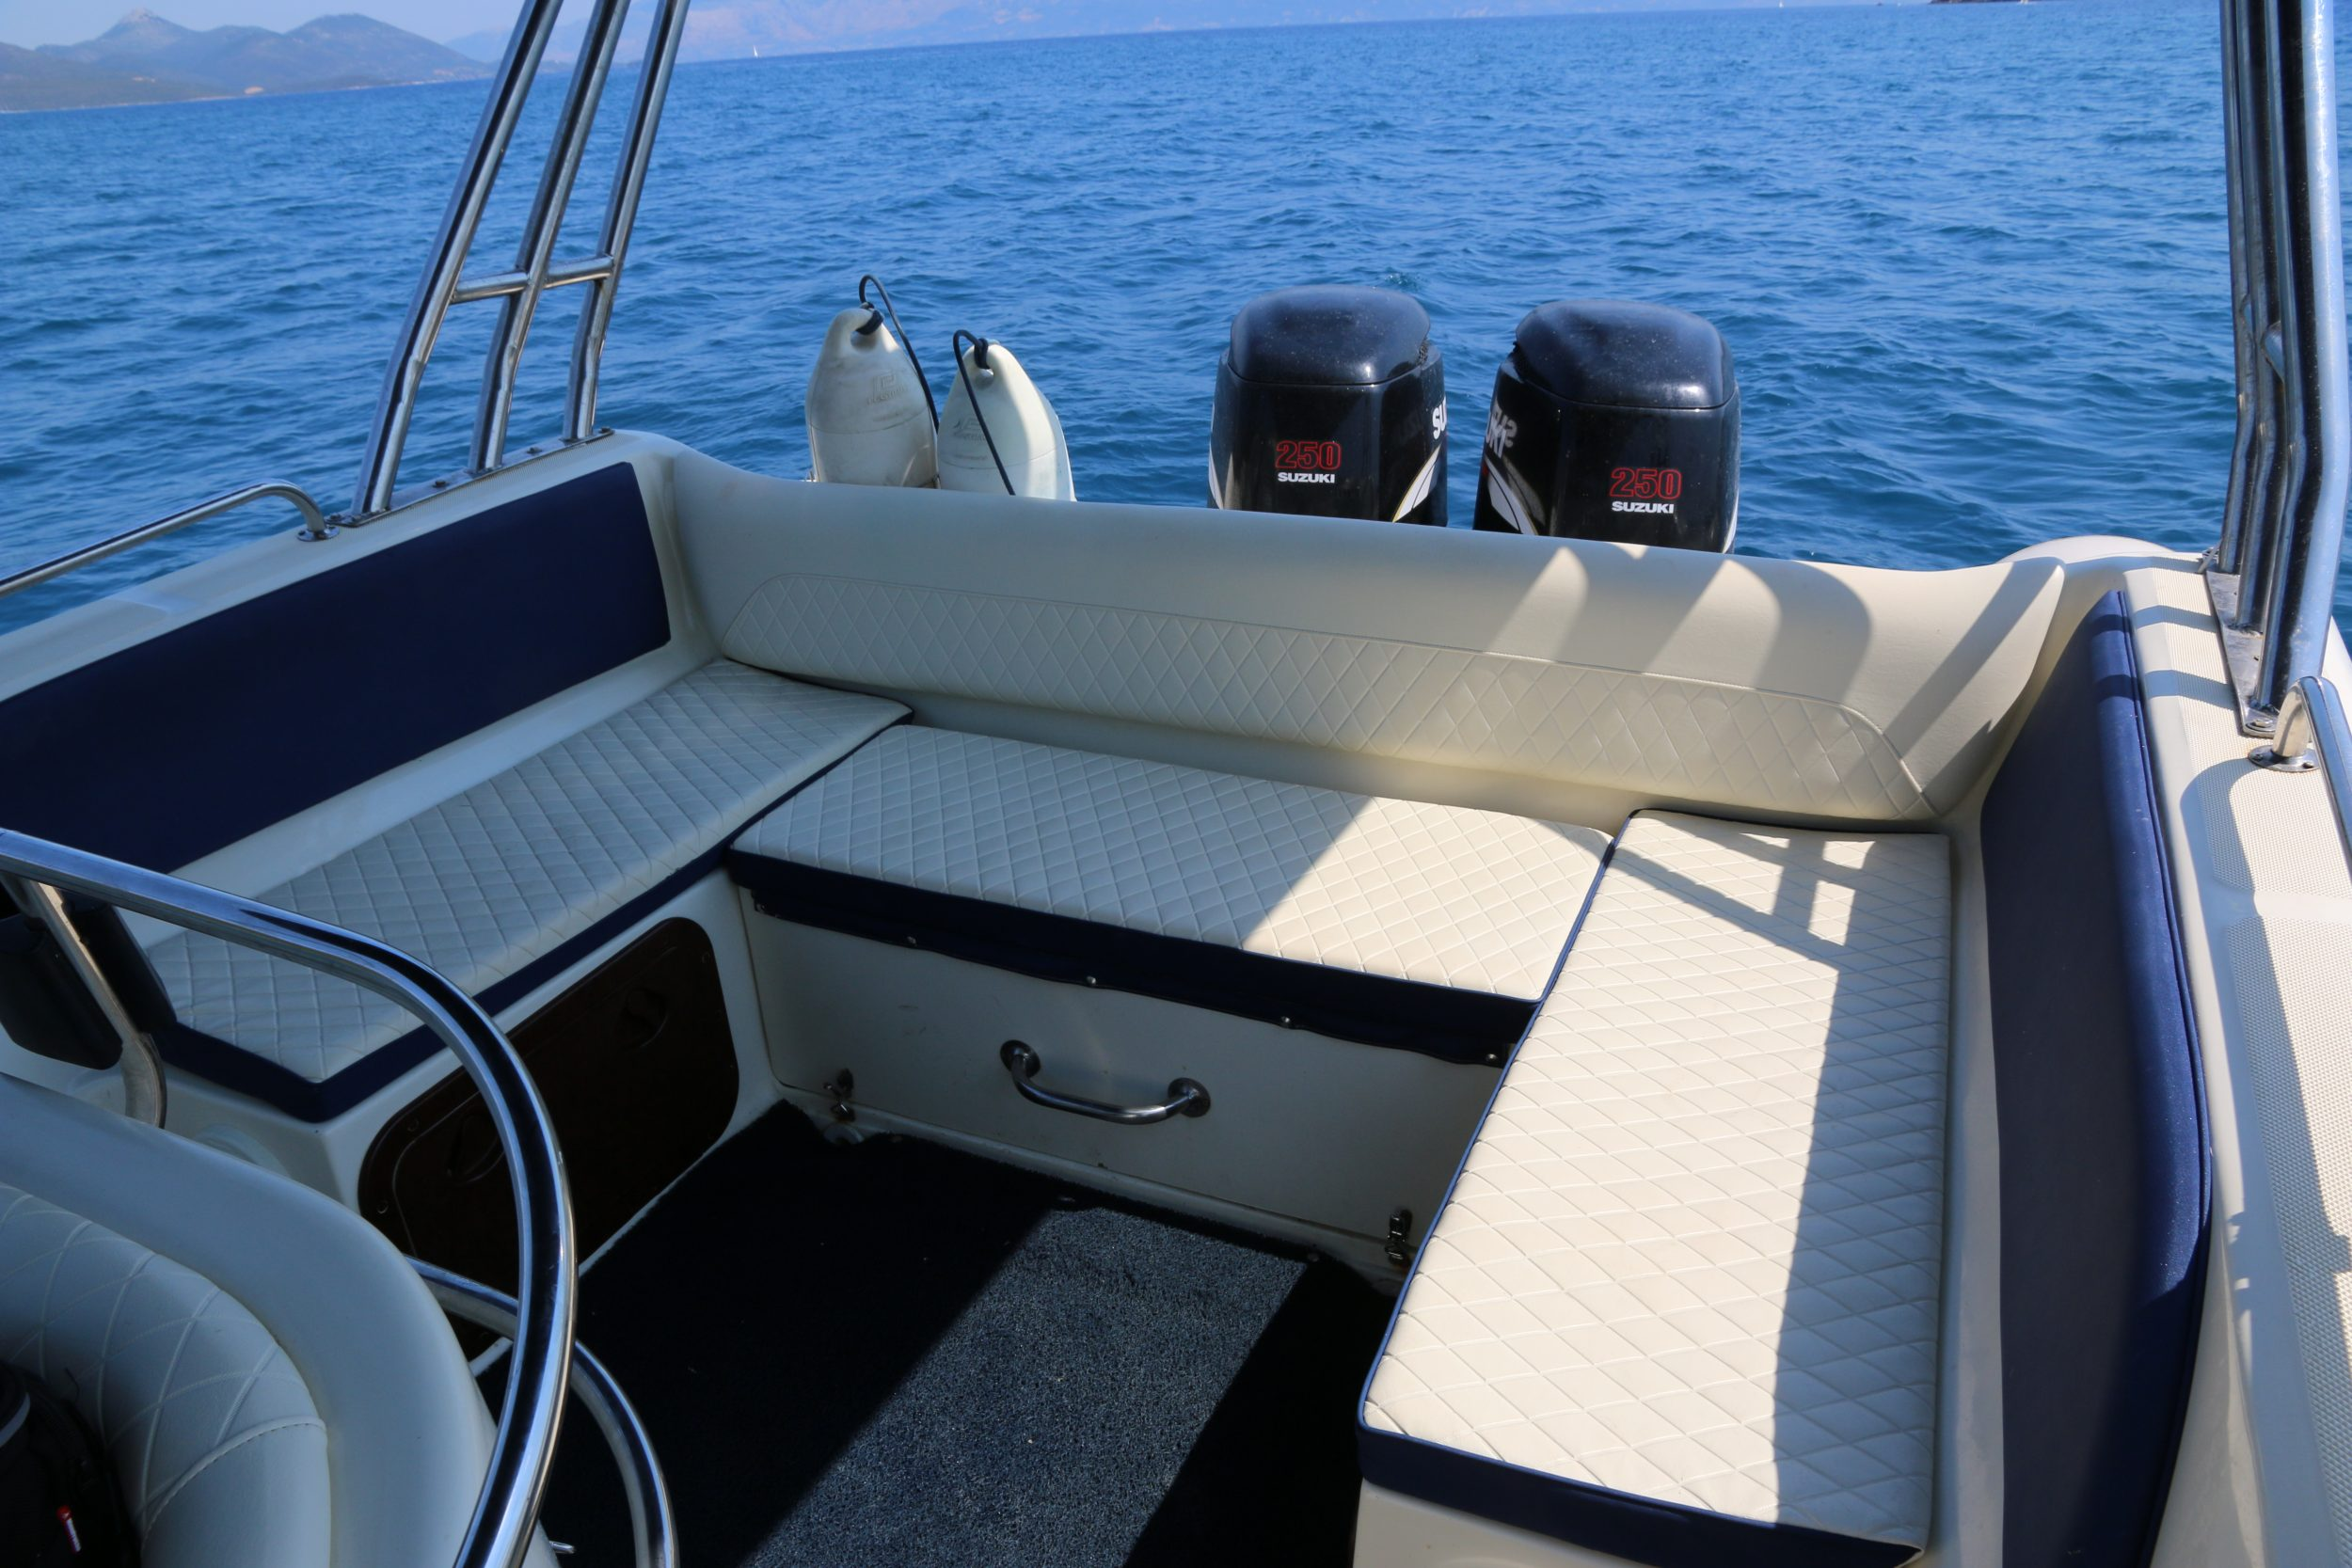 Trident boats Joy 4 Rib rental